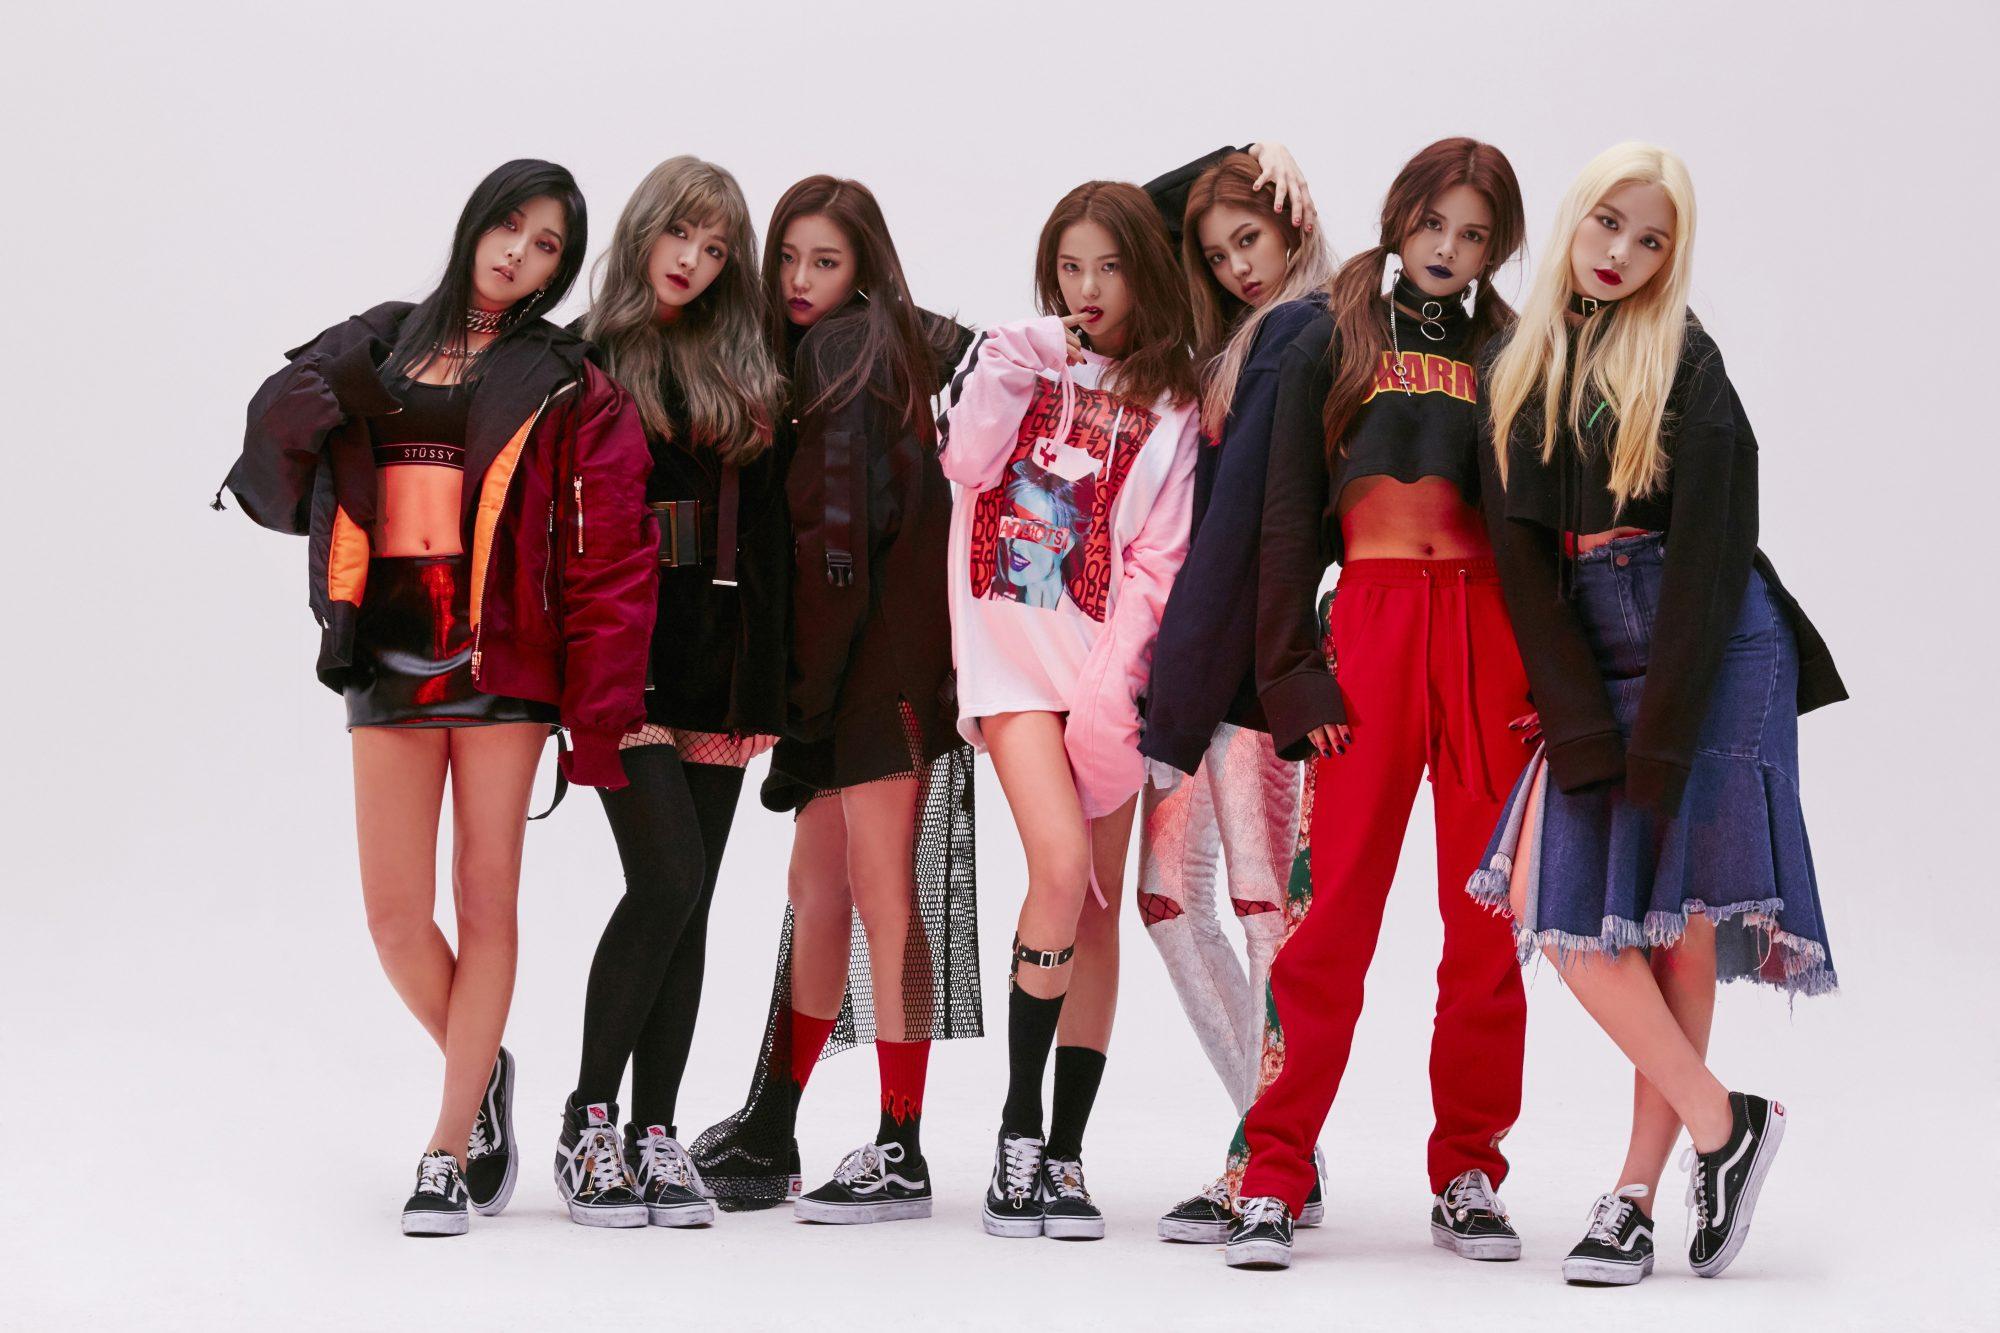 CLC's Latest Album Makes Top 10 On Billboard World Albums Chart